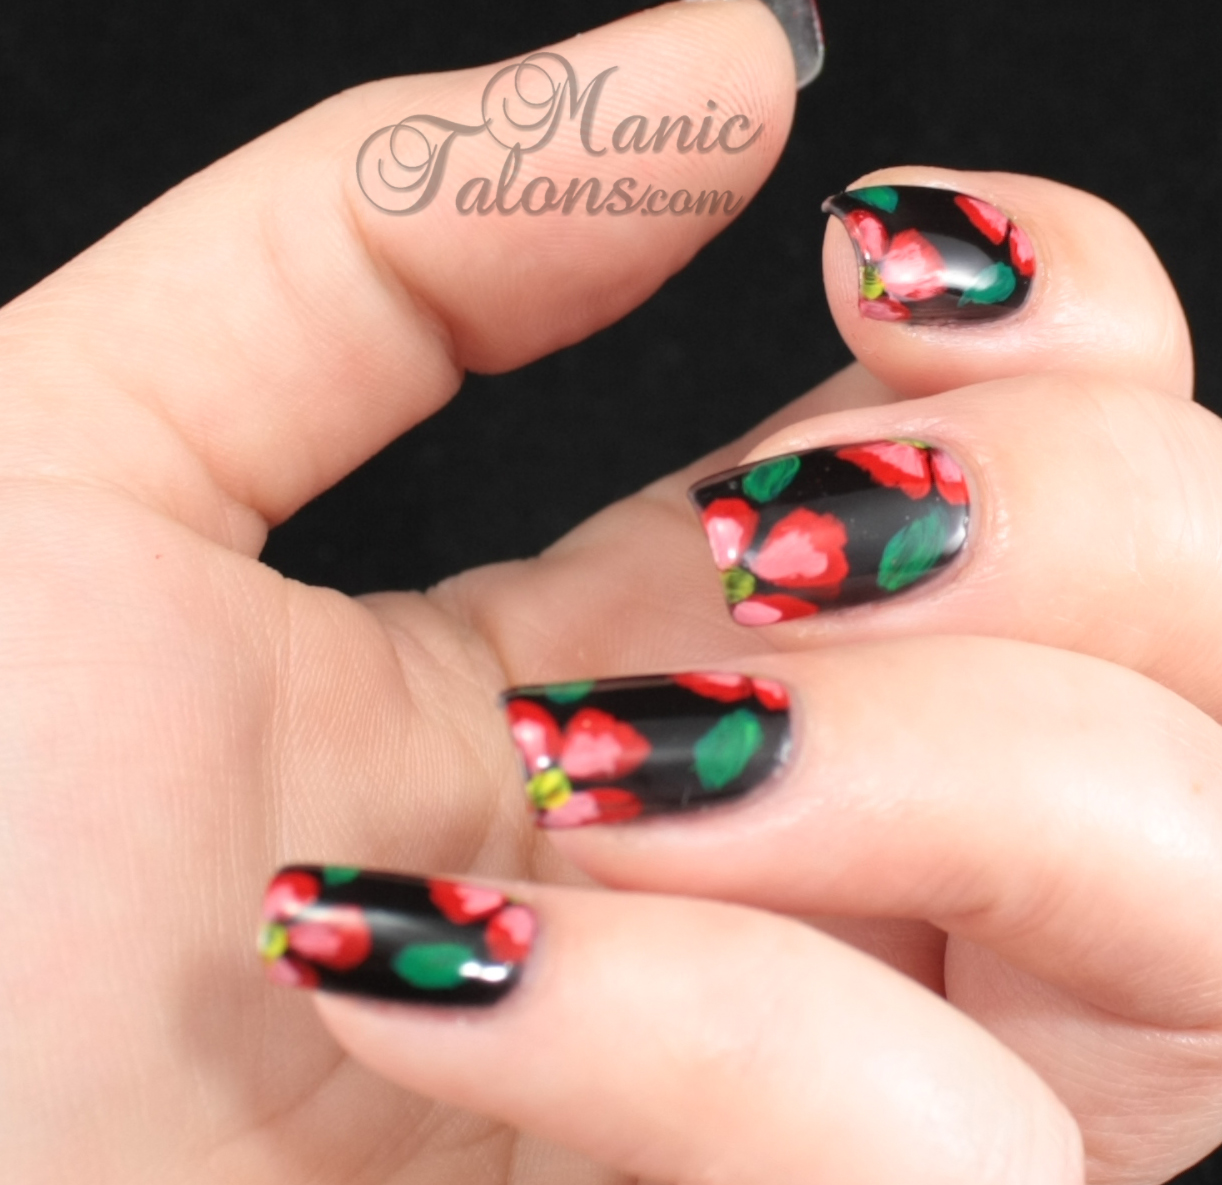 Manic Talons Nail Design: Not One Stroke Flower Nail Art